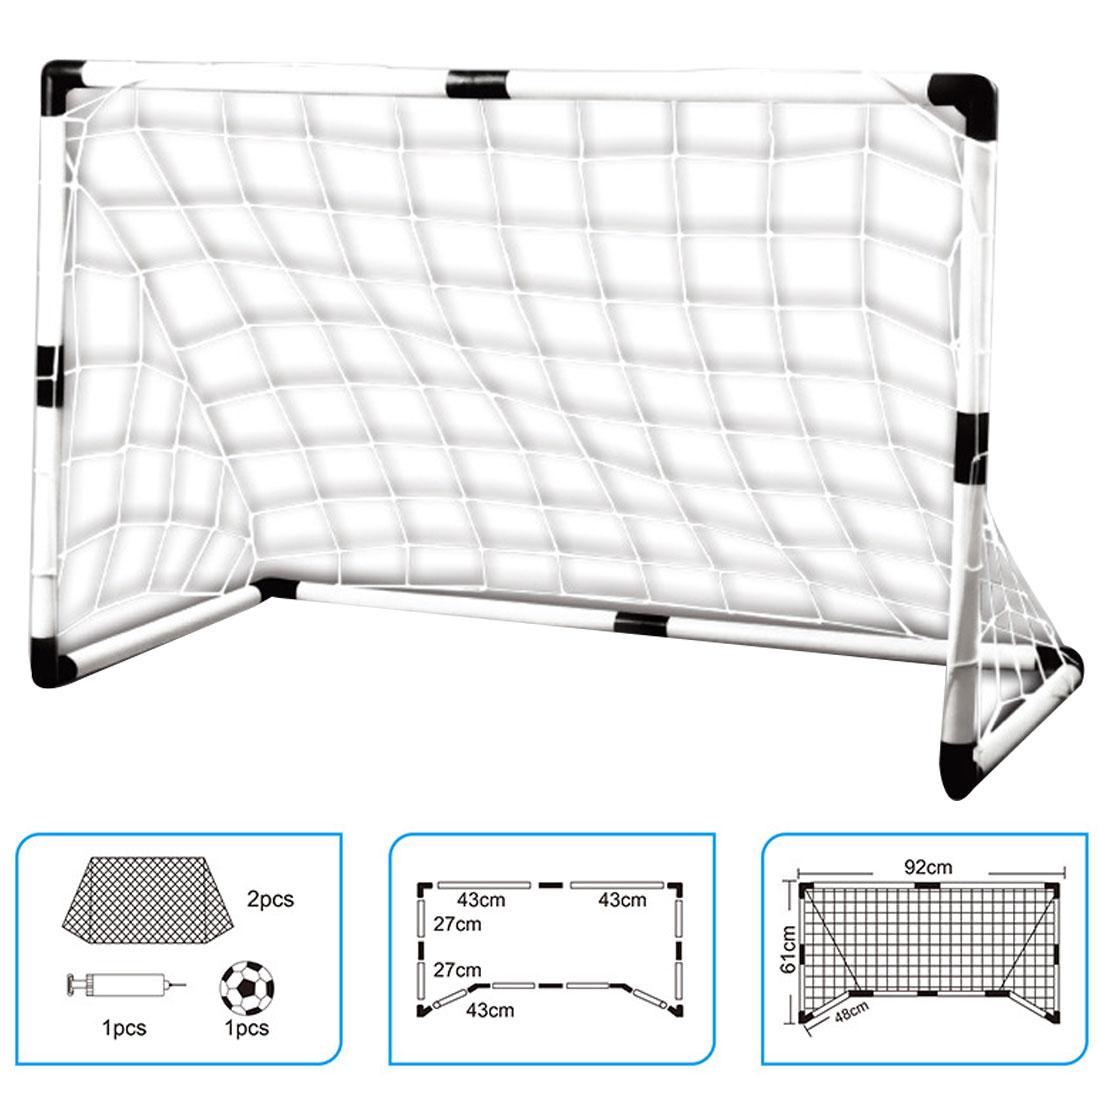 Hot Sale New 2 Sets Detachable Diy Children Sports Soccer Goals